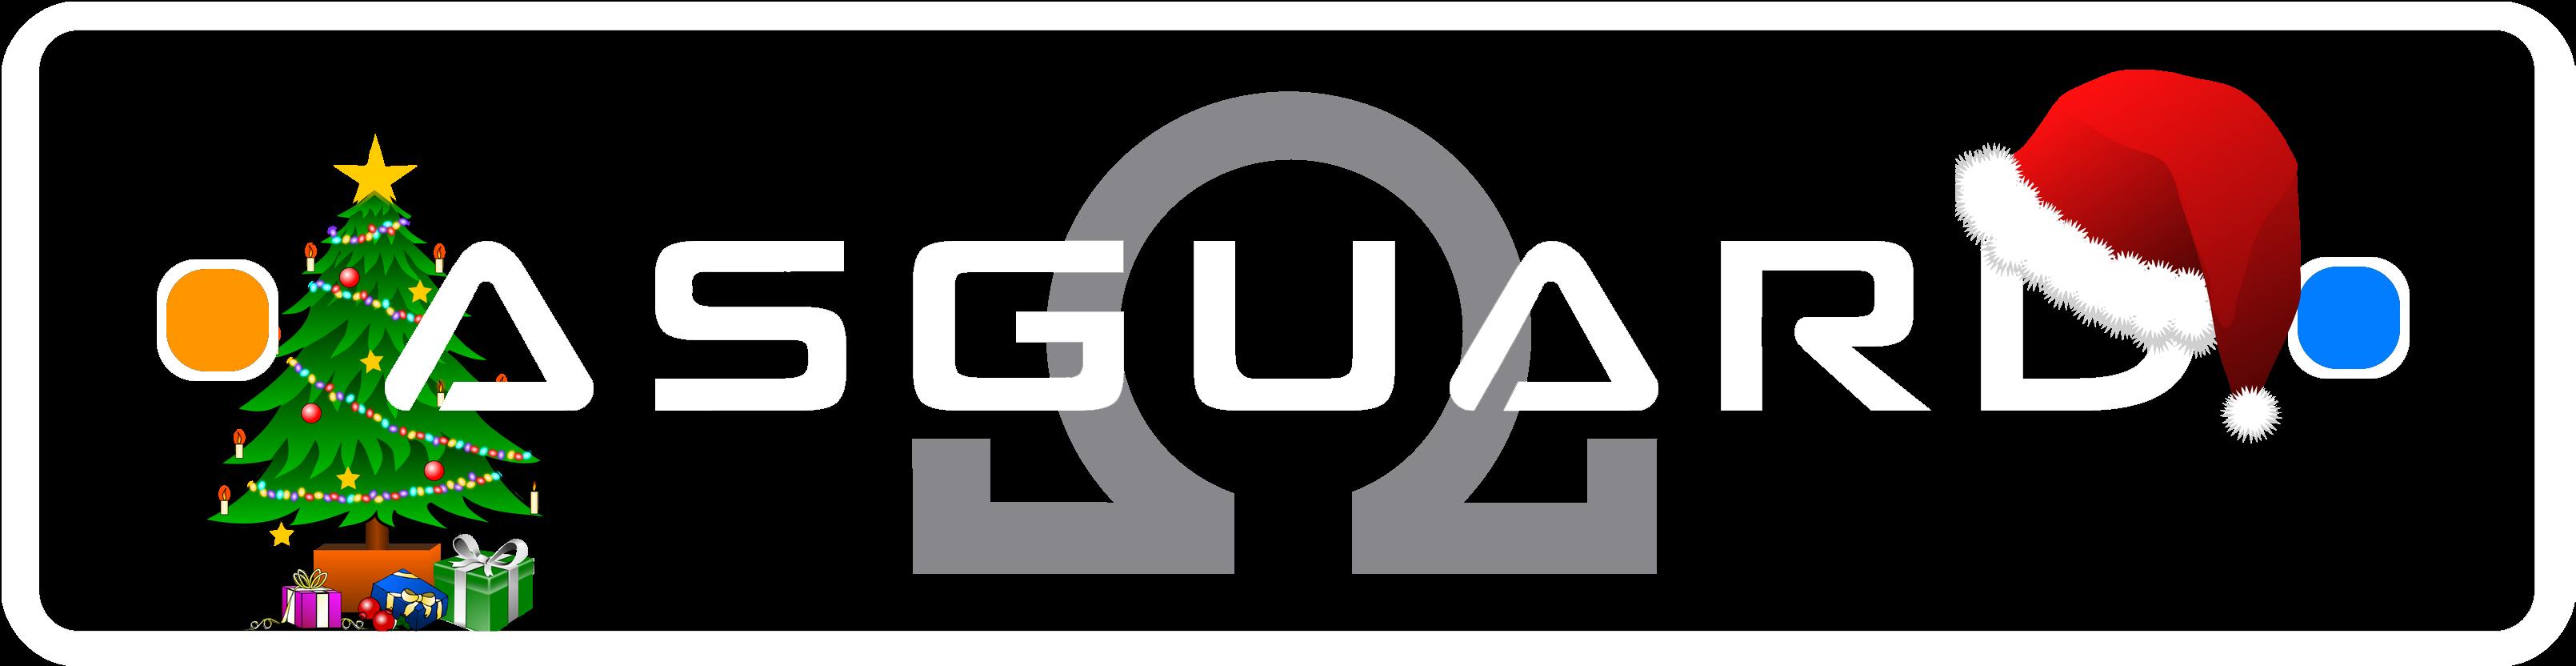 Logo Asguard starmade